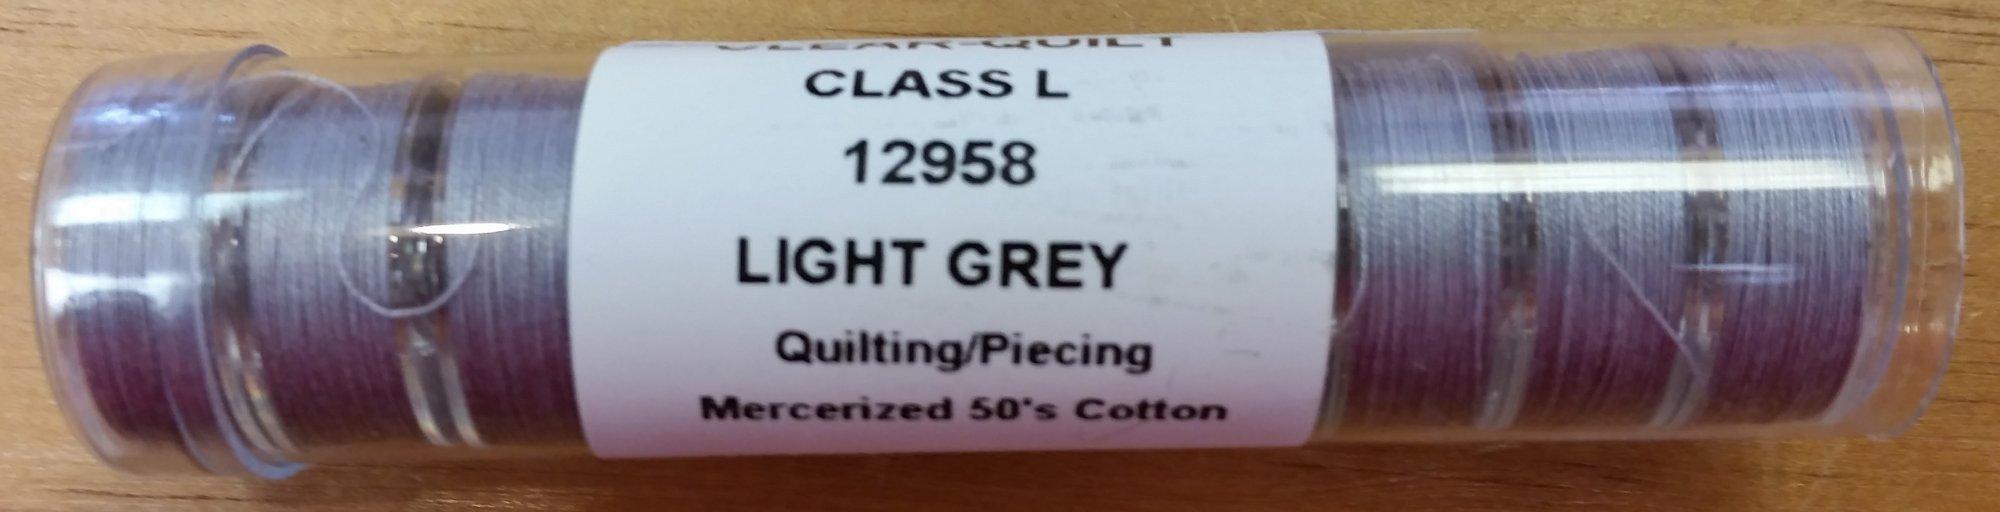 Prewound Bobbins Cotton Light Grey Tube